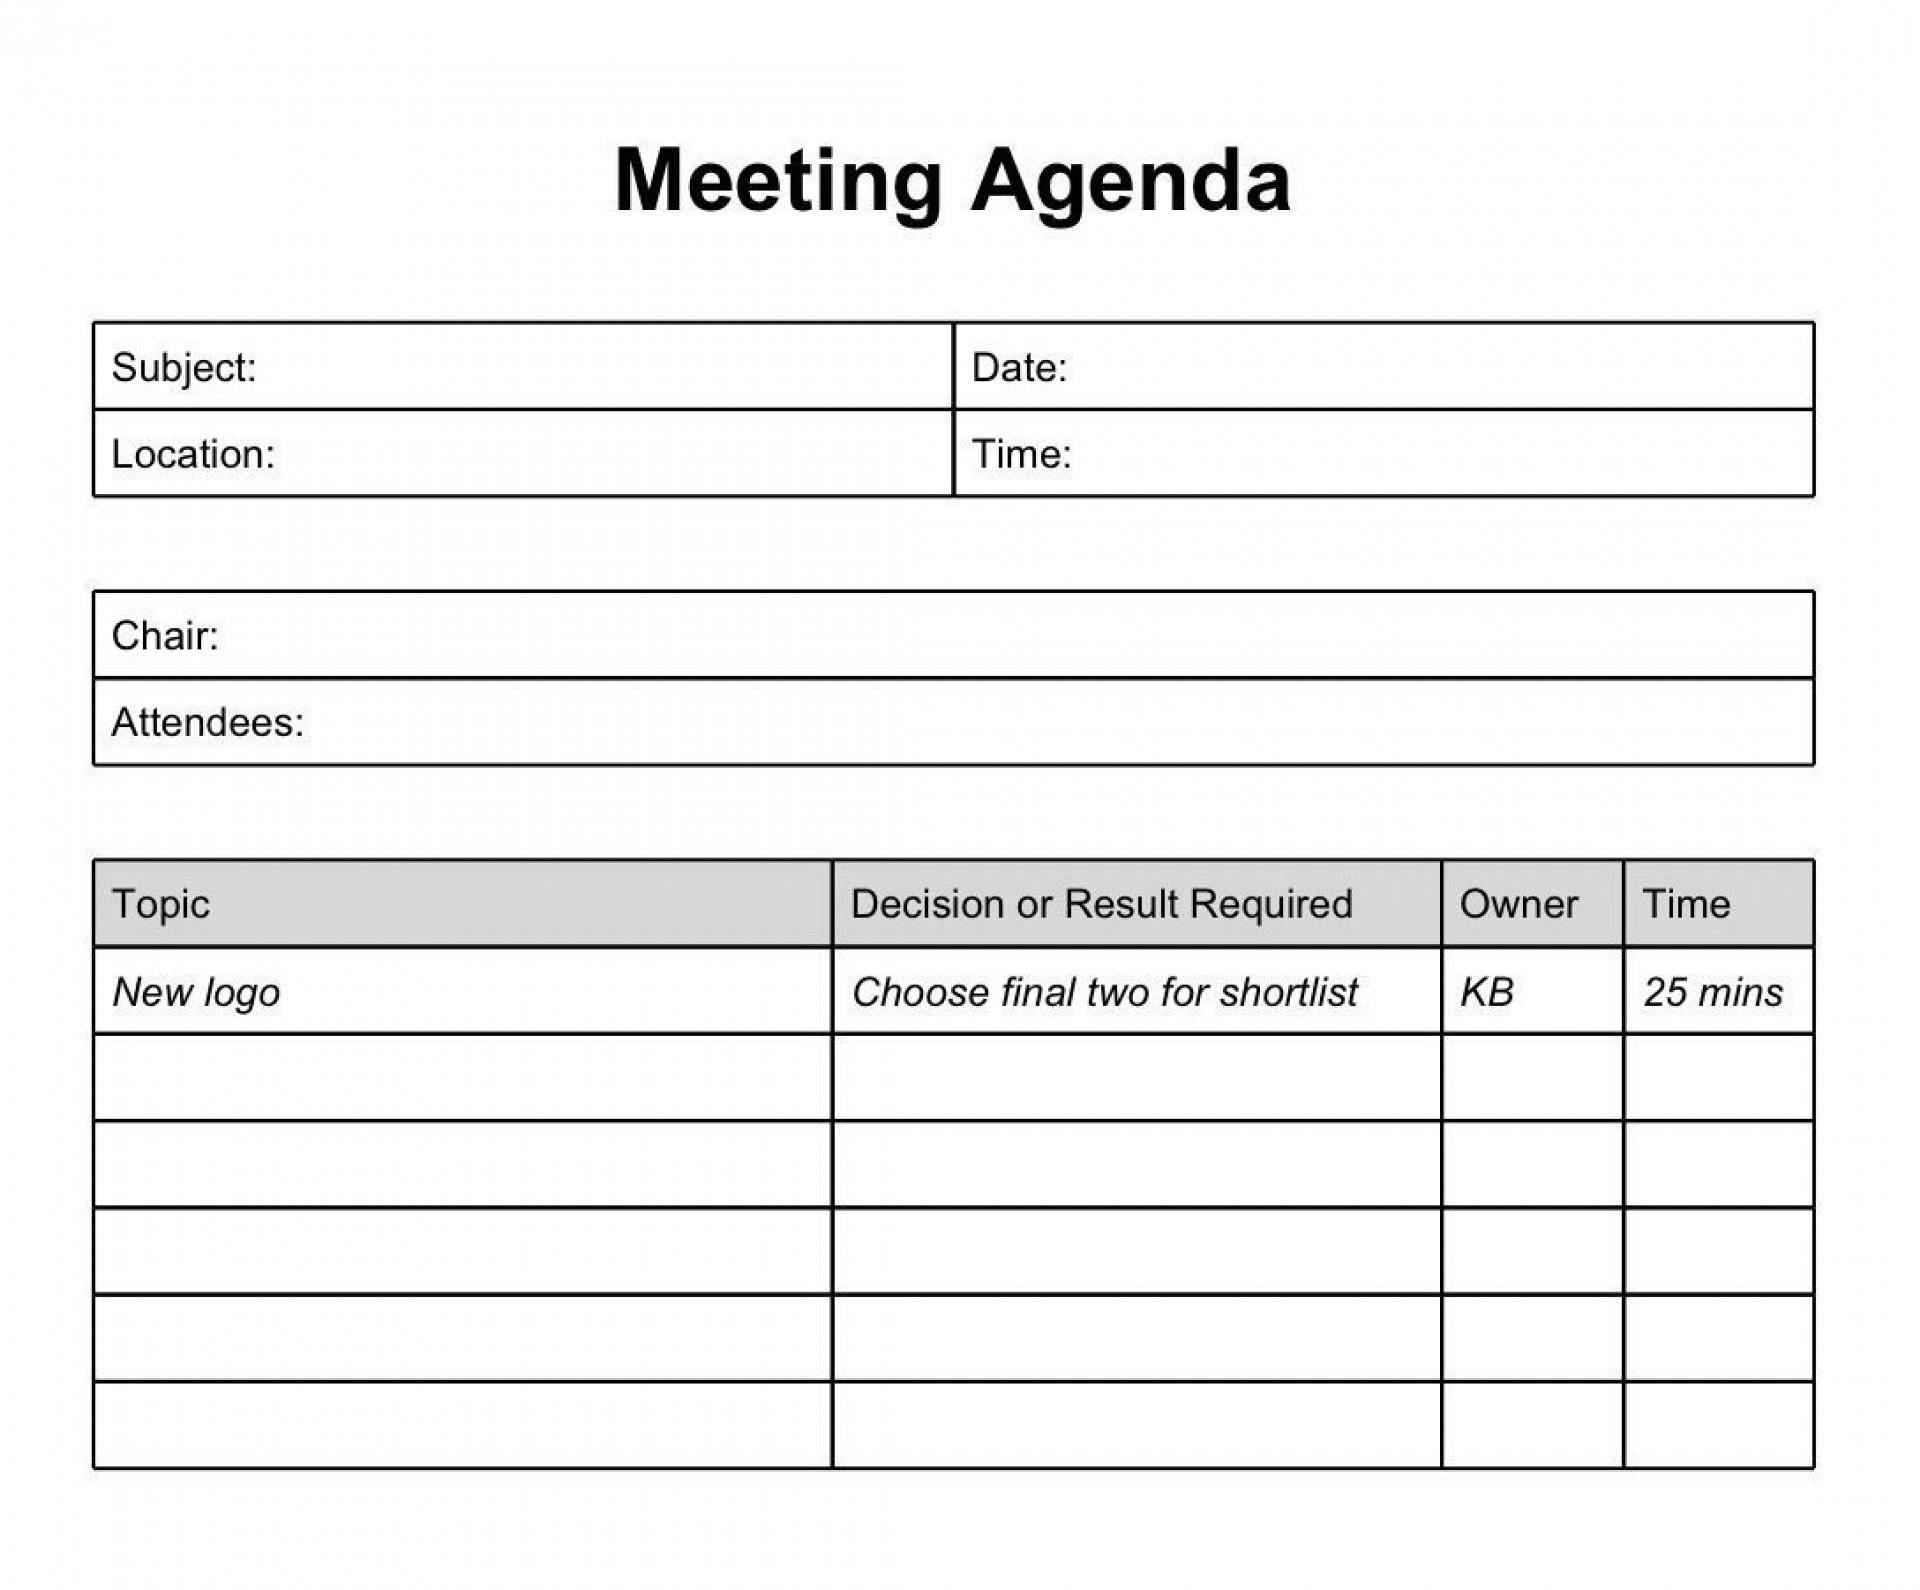 004 Surprising Formal Meeting Agenda Template High Def  Board Example Pdf1920